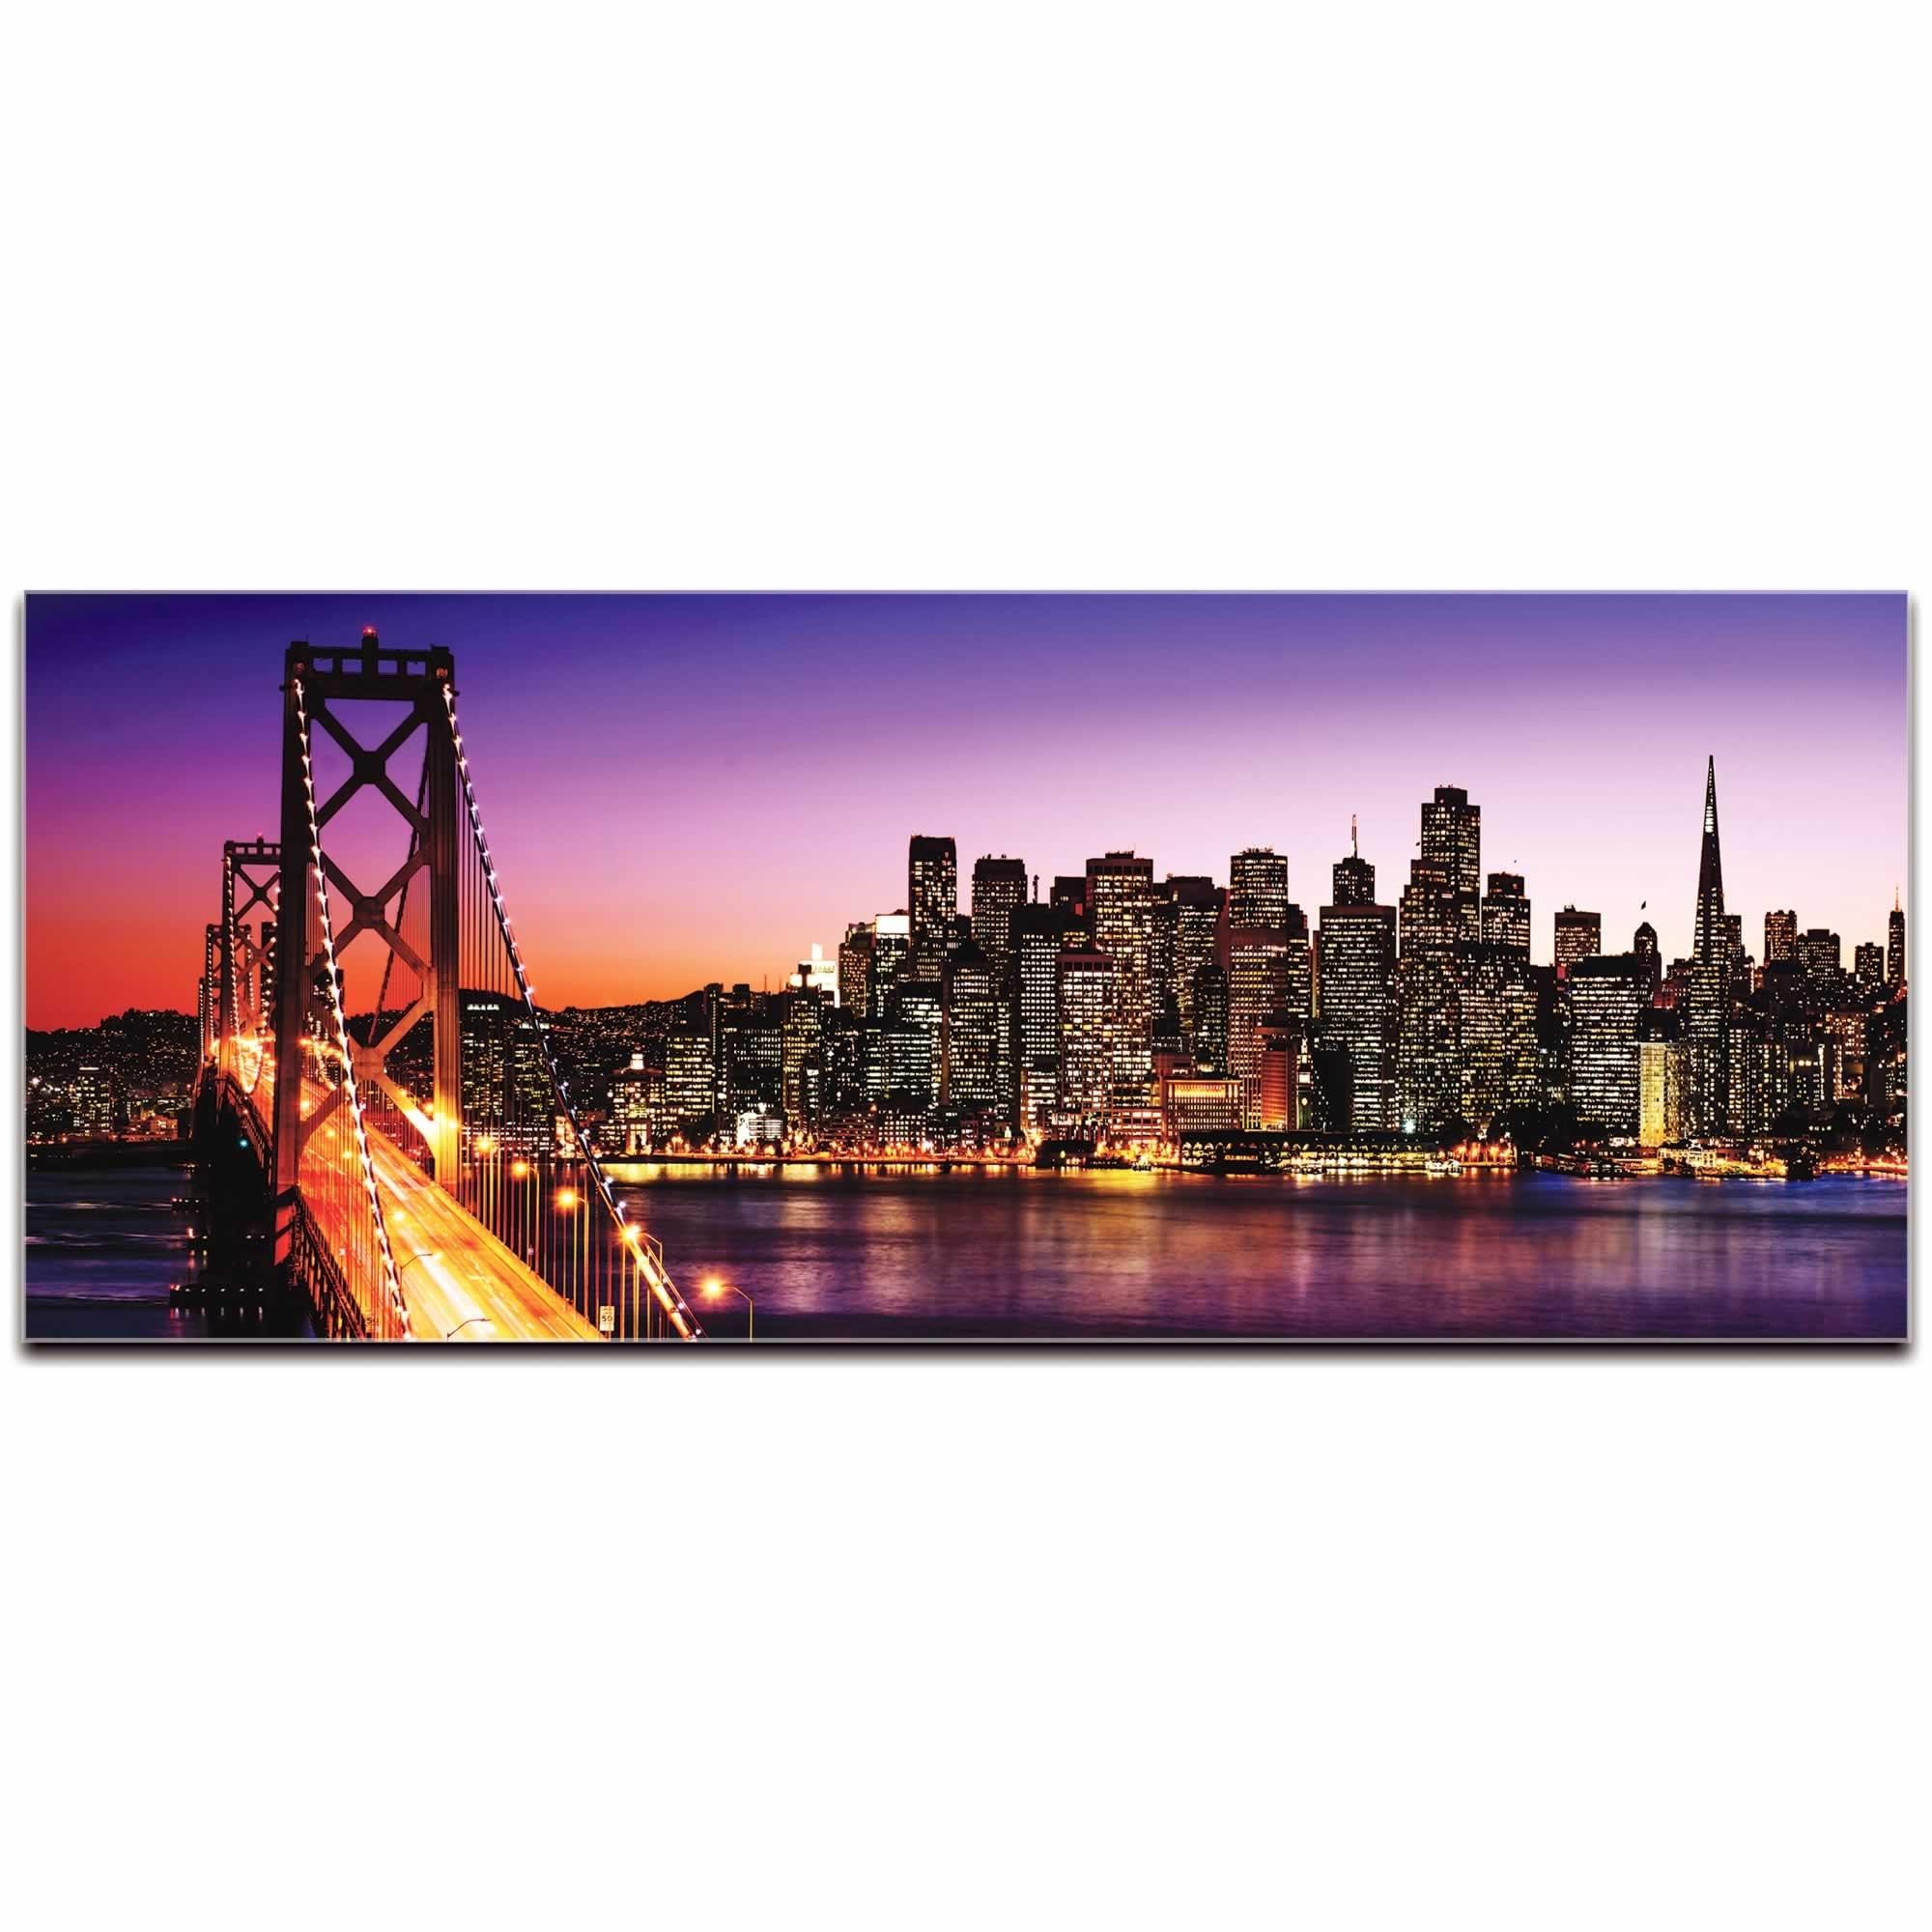 Metal Art Studio – San Francisco City Skyline | Urban Modern Art Regarding Most Current San Francisco Wall Art (View 6 of 20)